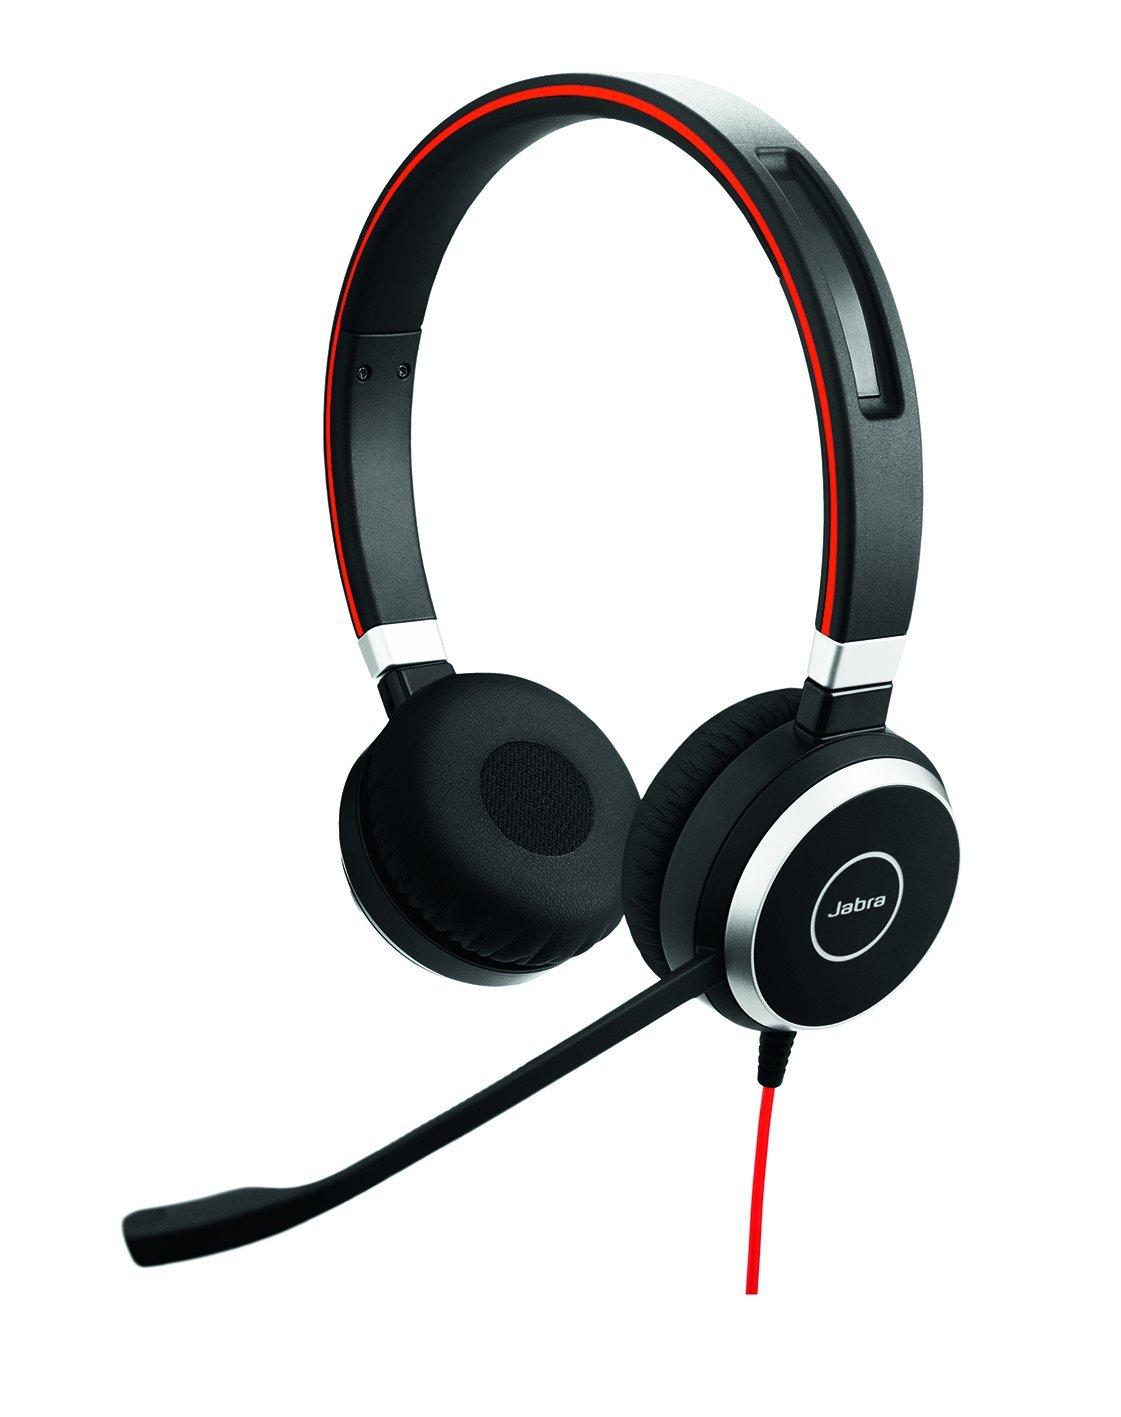 Jabra Evolve 40 Stereo MS - Professional Unified Communicaton Headset 6399-823-109